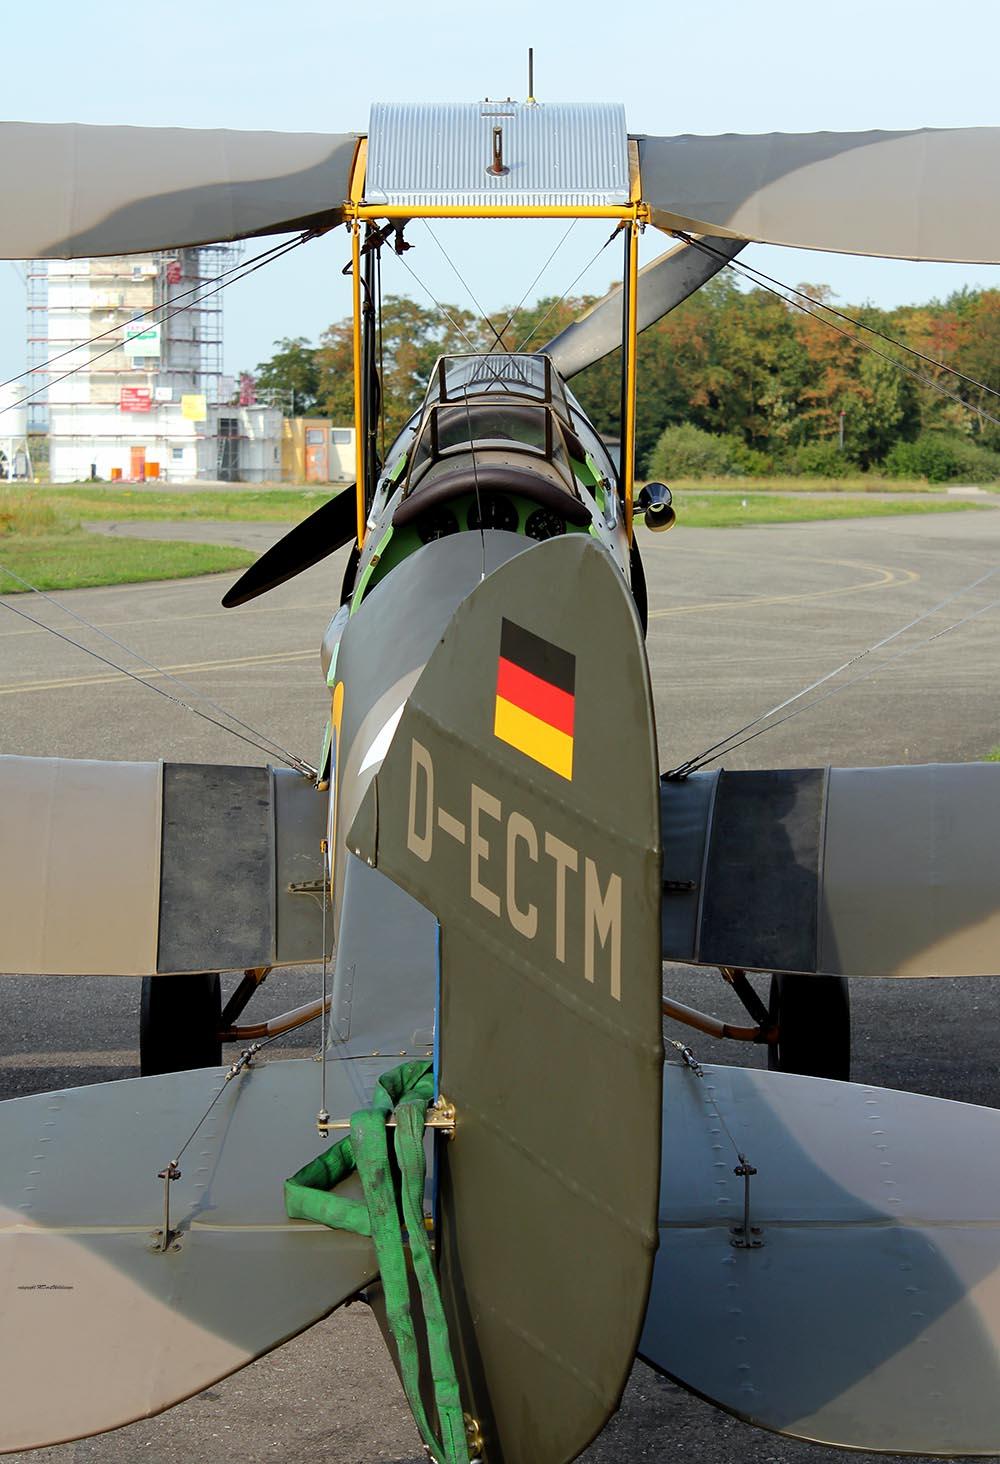 De_Havilland_TigerMoth_D-ECTM_2011-08-2518.jpg